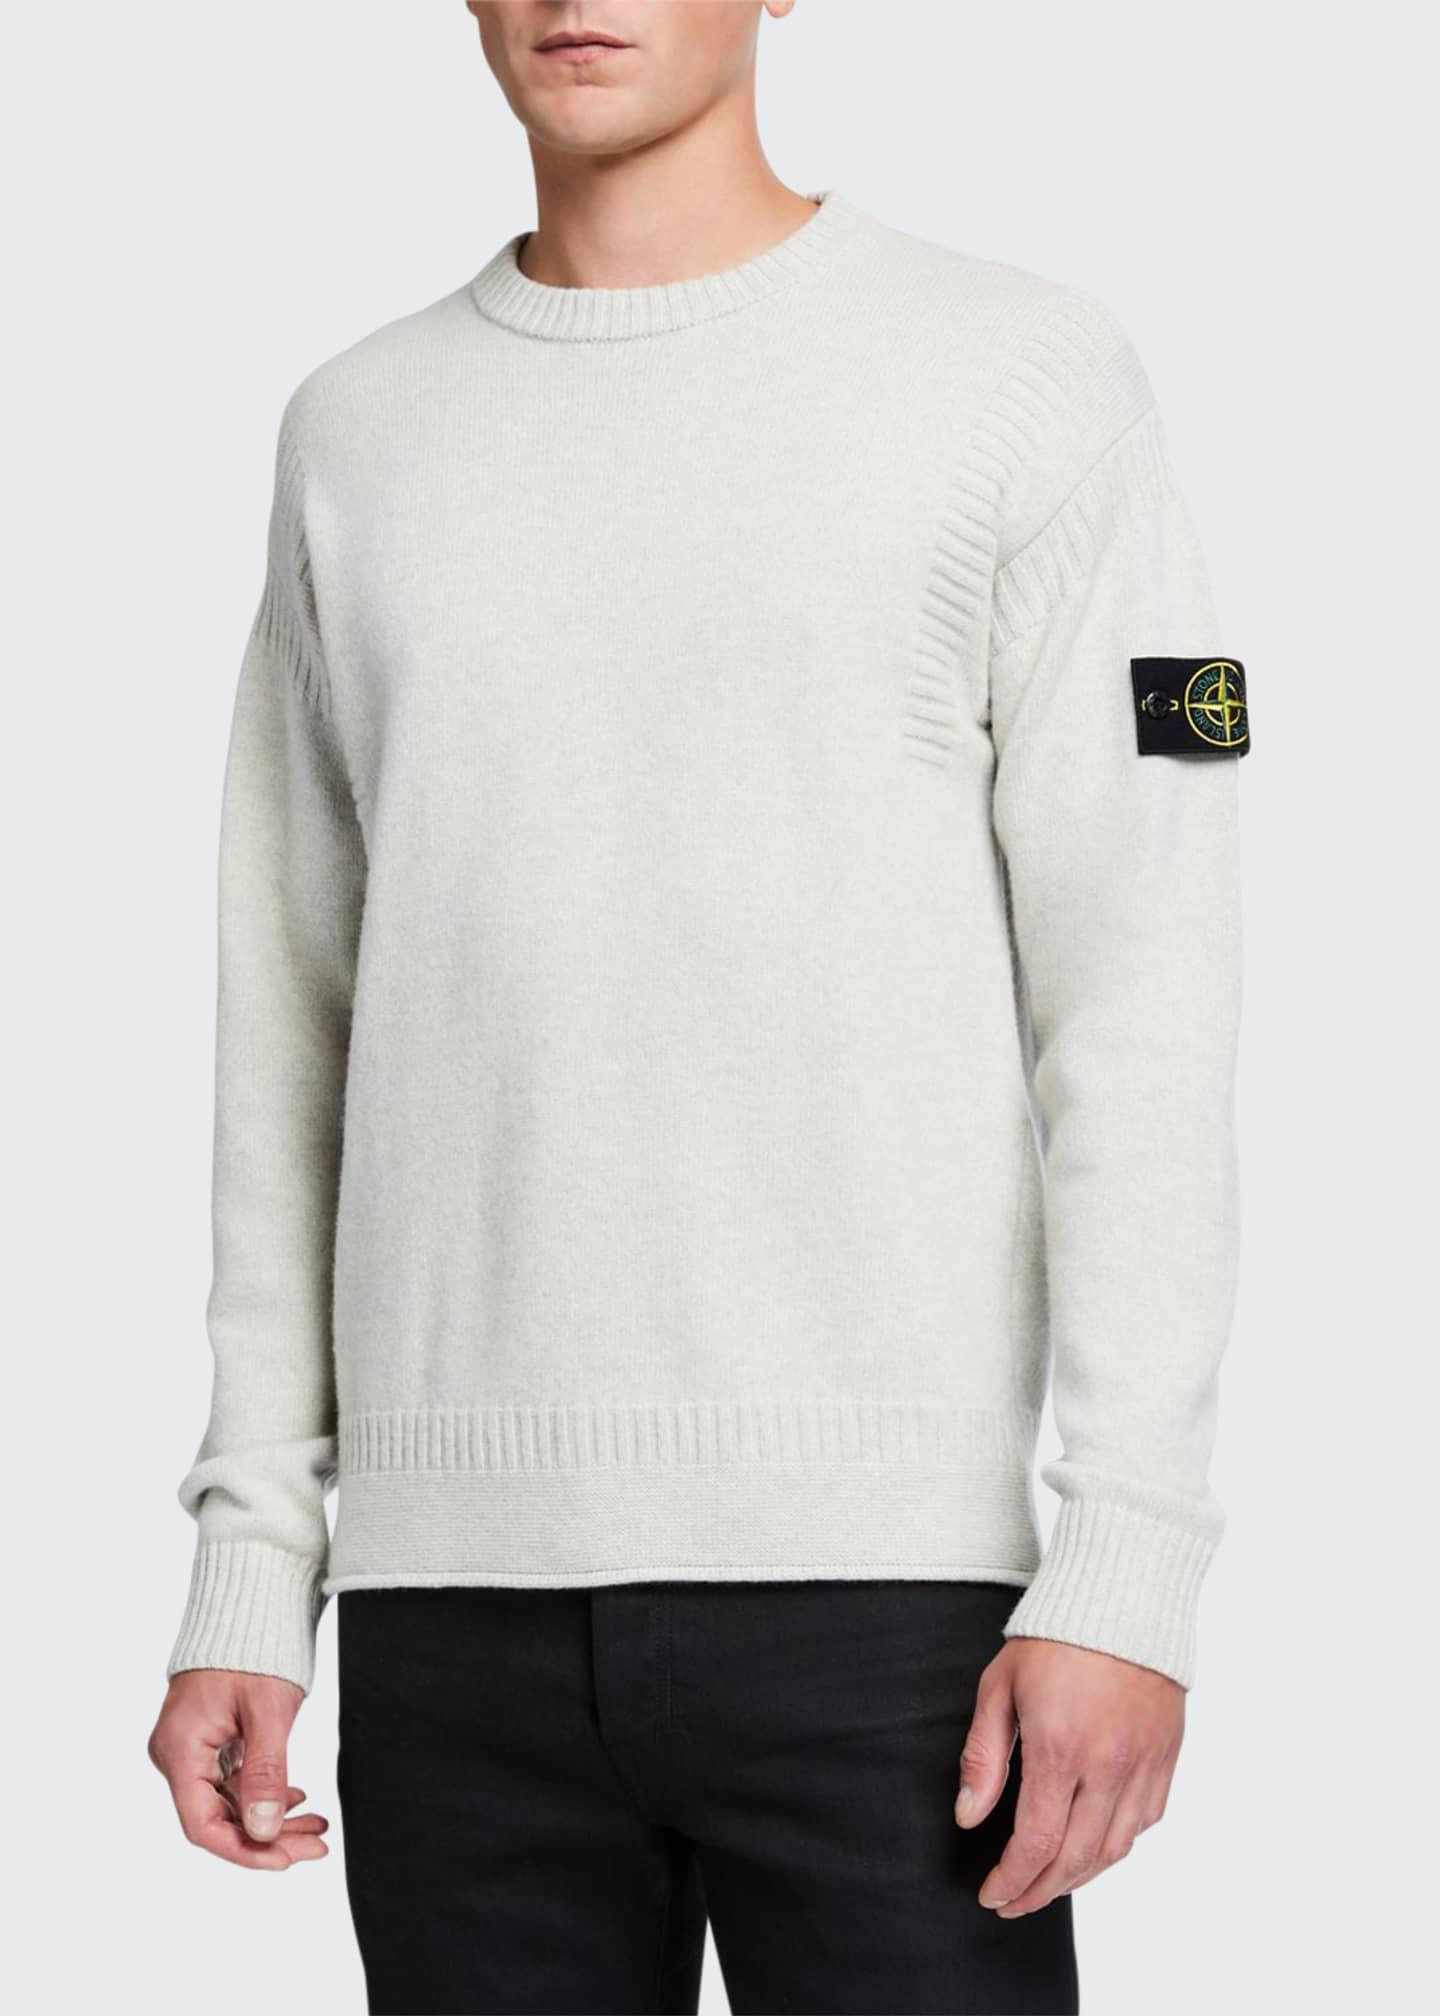 Stone Island Men's Solid Wool Sweater w/ Rib